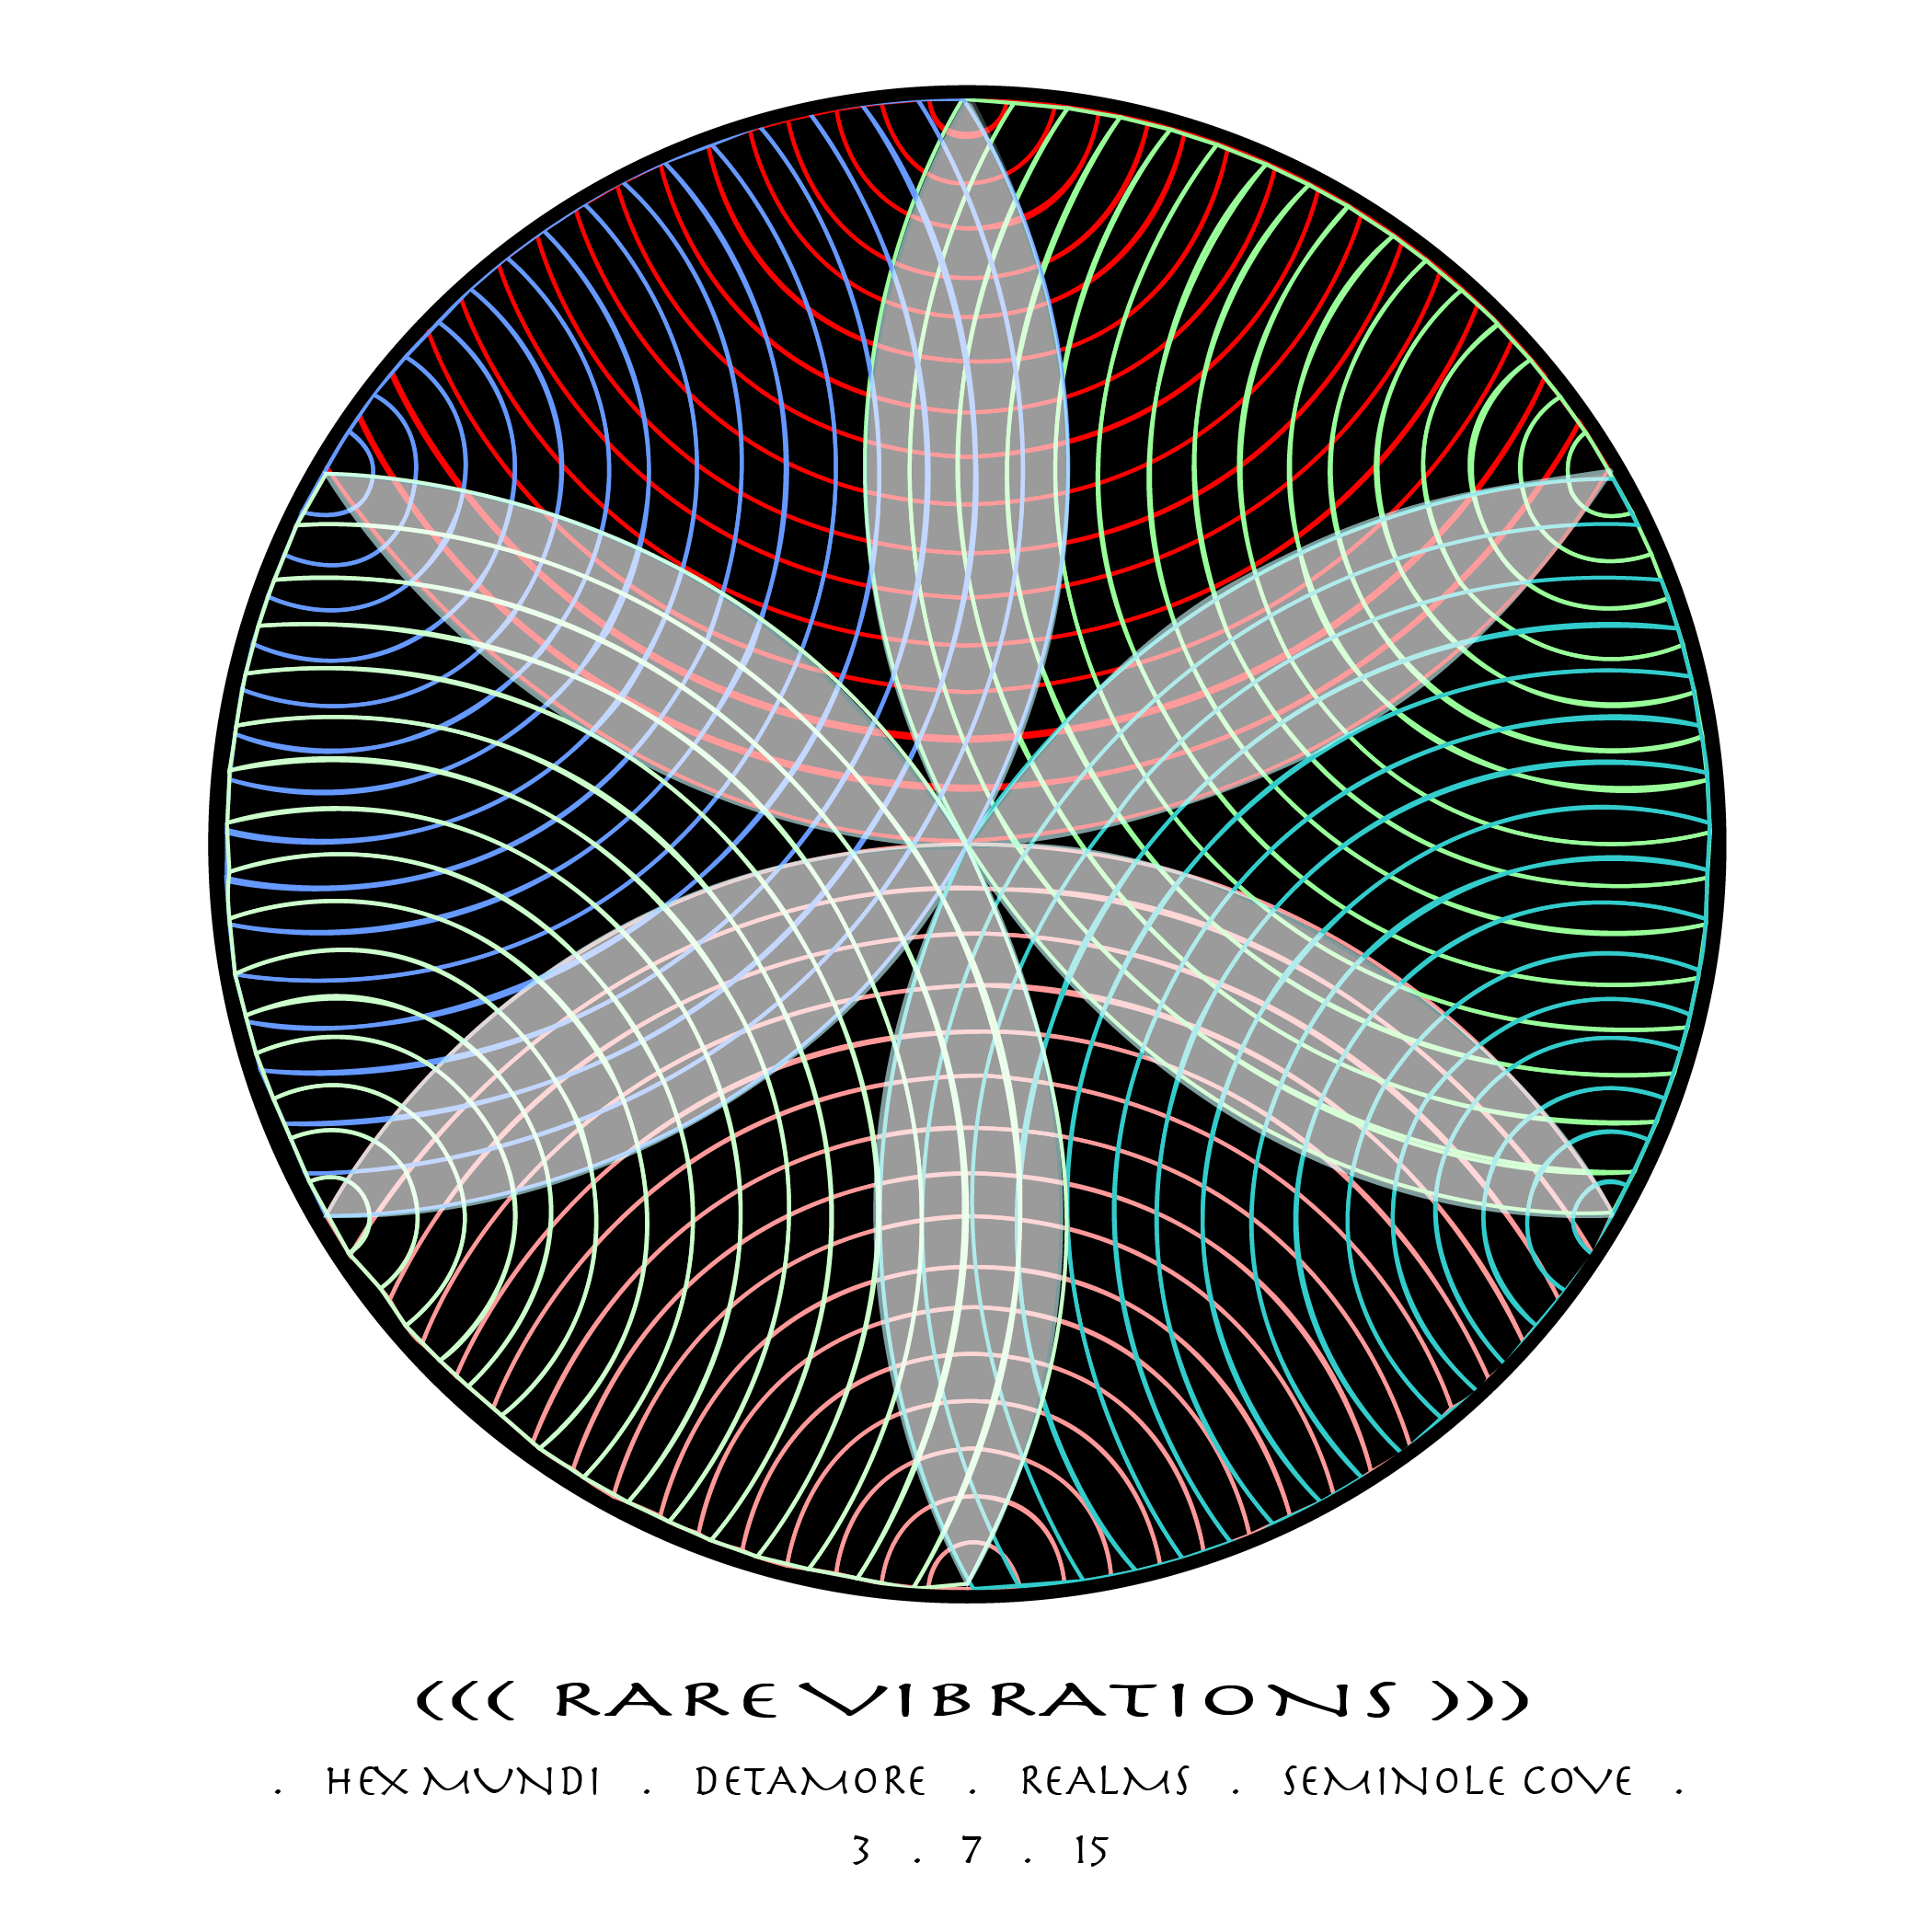 Rare Vibrations Poster 3.7.15-01.jpg